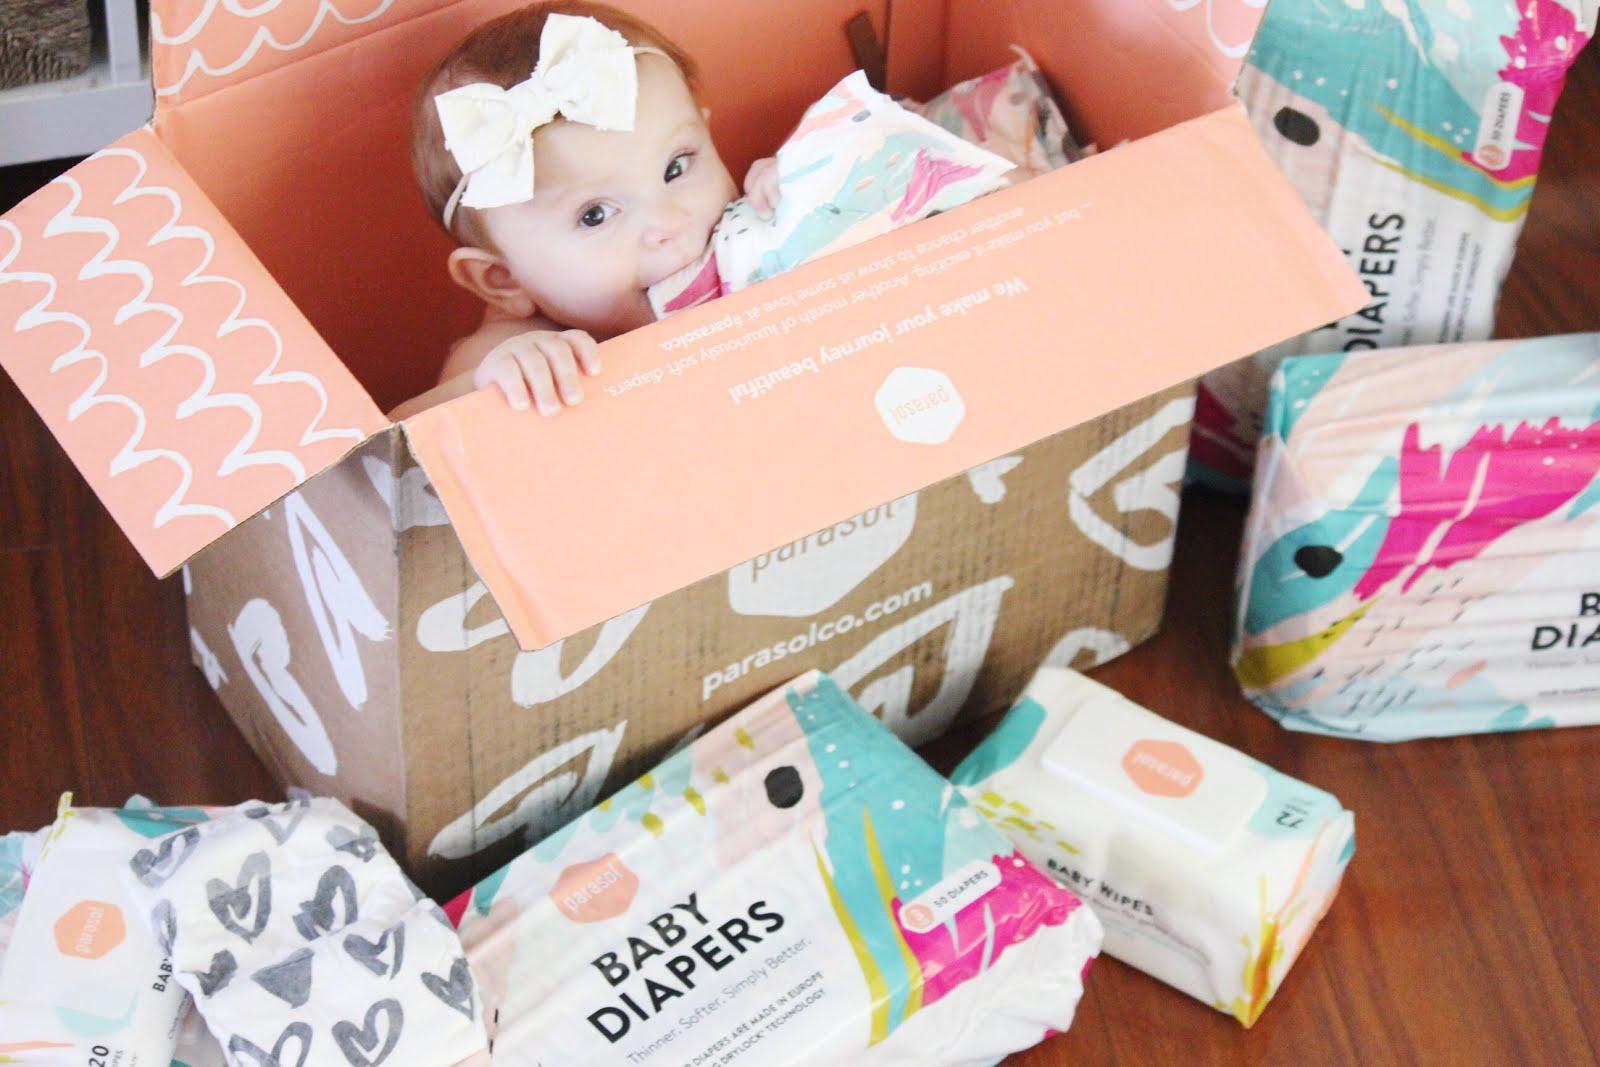 A Little J K Sensitive Baby Skin Parasol Review Lotion